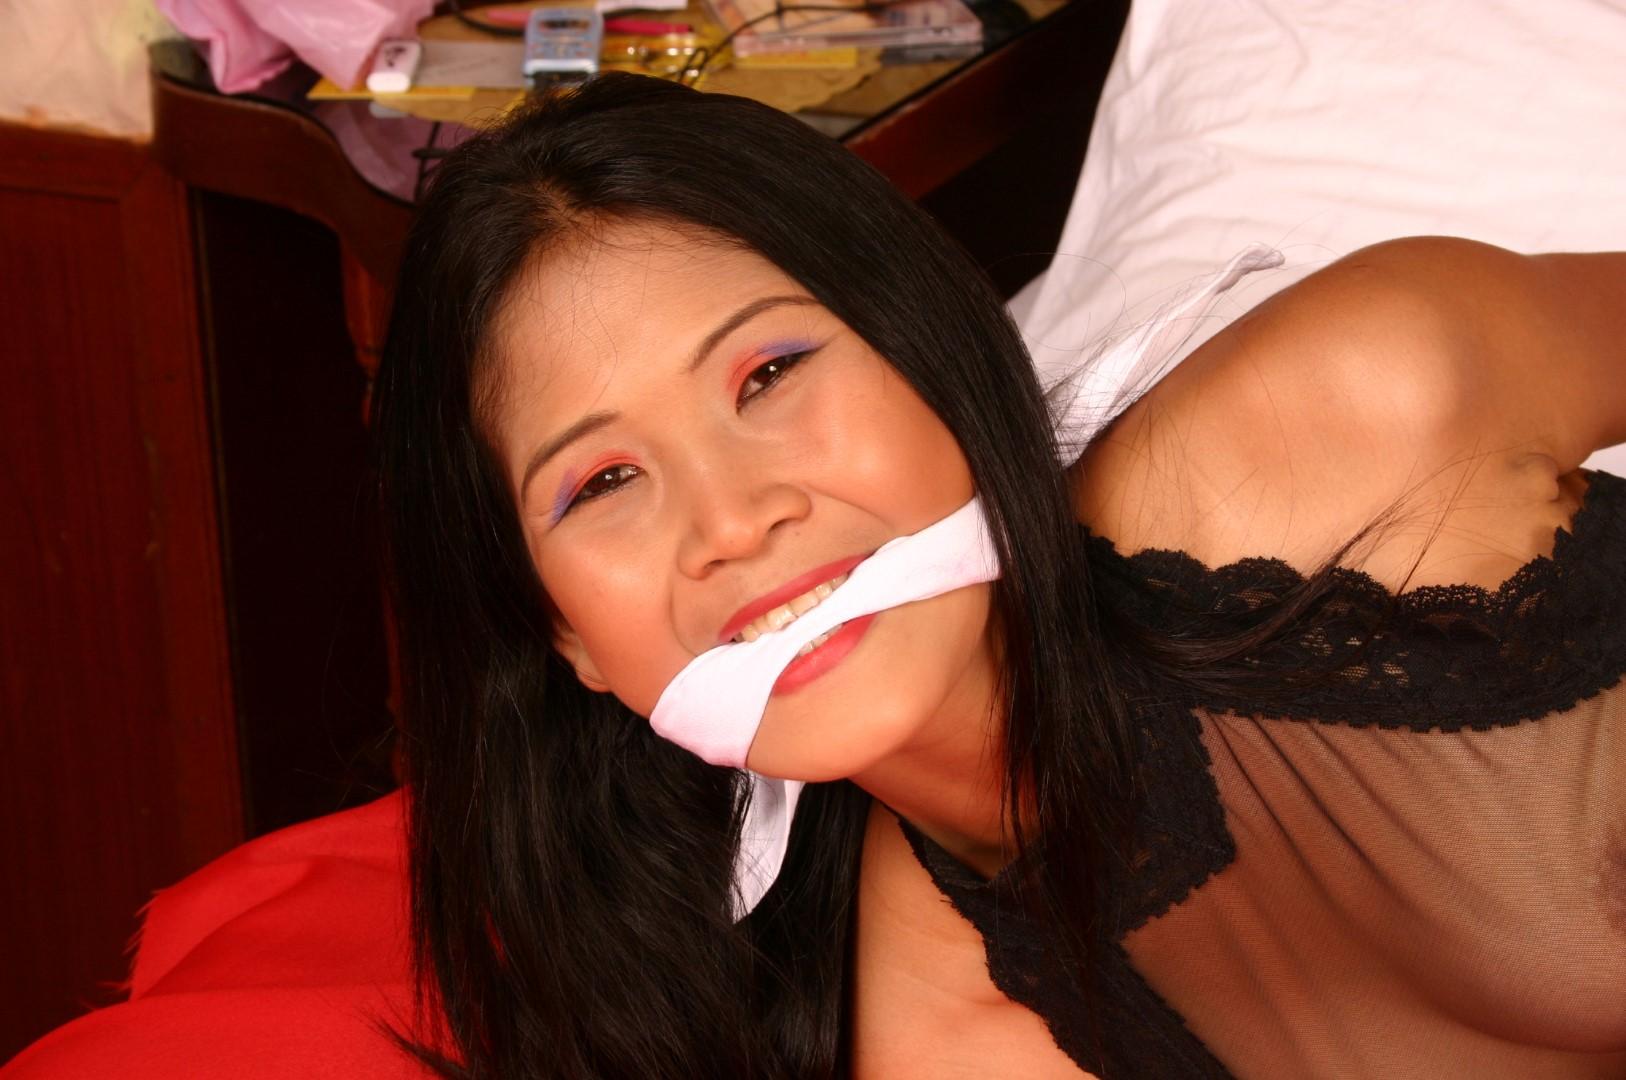 Asian Mom Facial Uncensored Porn asian mature lbfm - megapornx